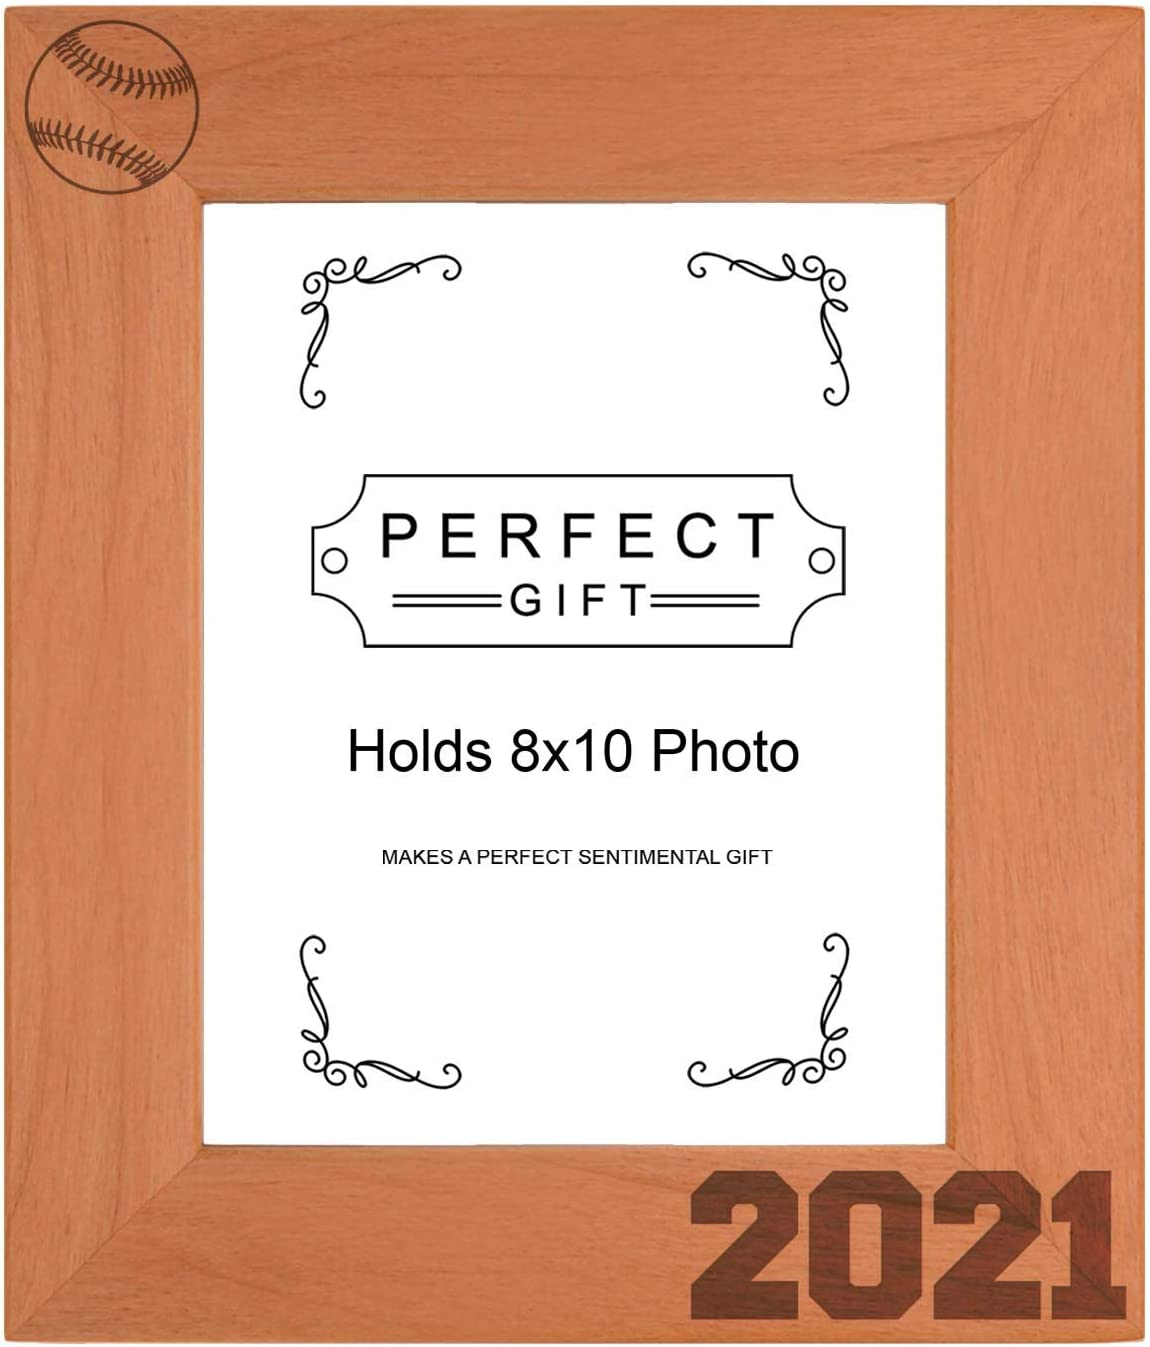 Sentimental Photo Frame Baseball 2021 Max Latest item 52% OFF Wood 8x10 Portrai Engraved